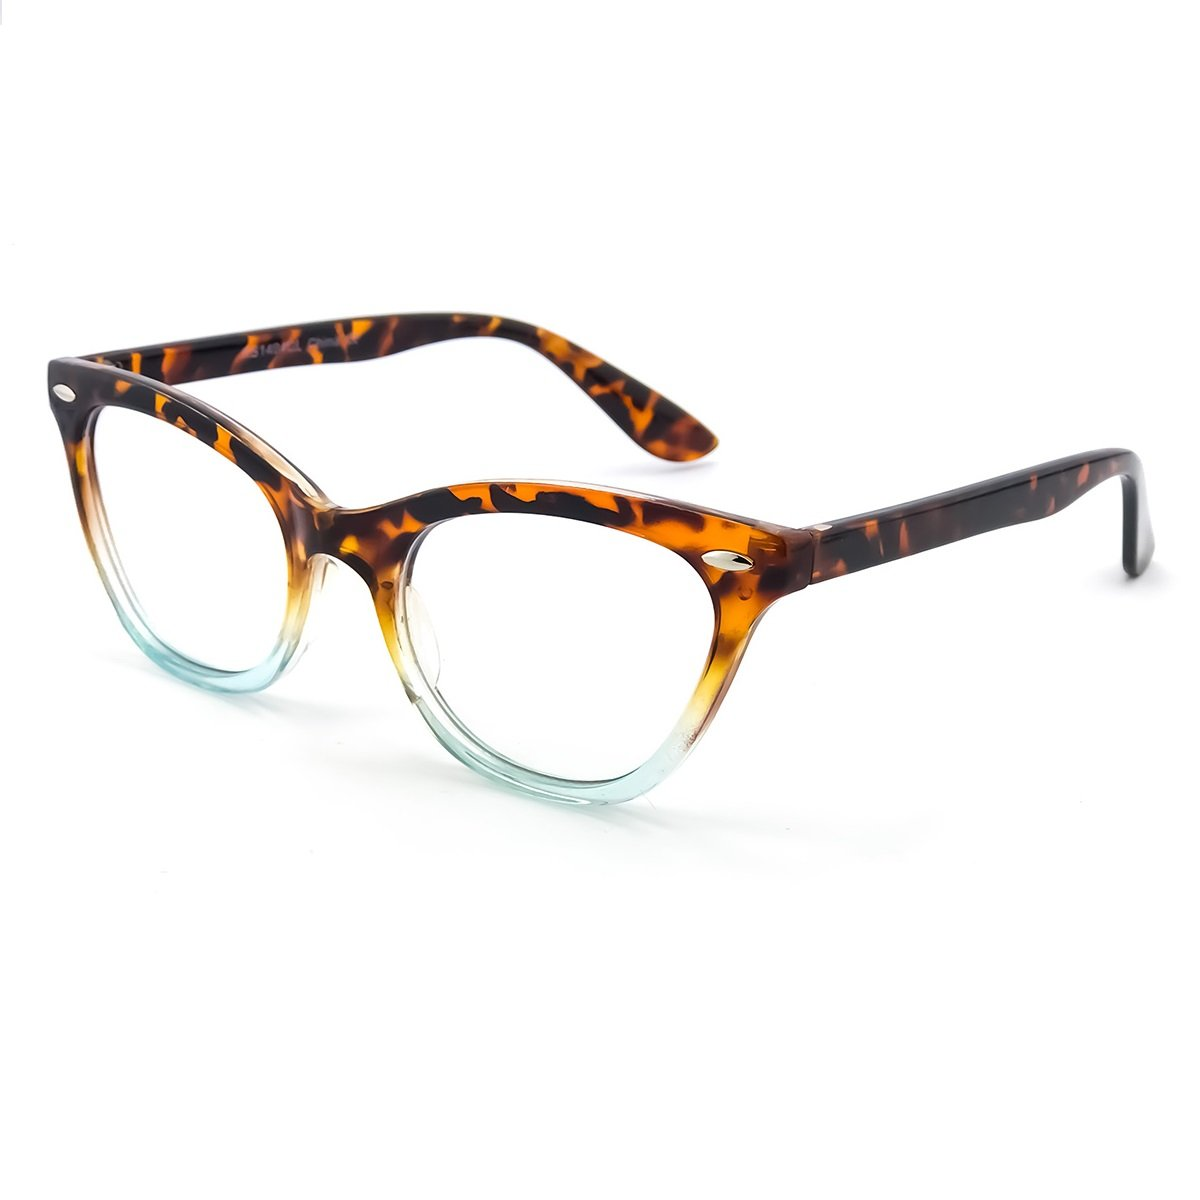 Kiss Brillen in neutralen CAT-EYE PIN-UP mod. BICOLORED - fassung ...